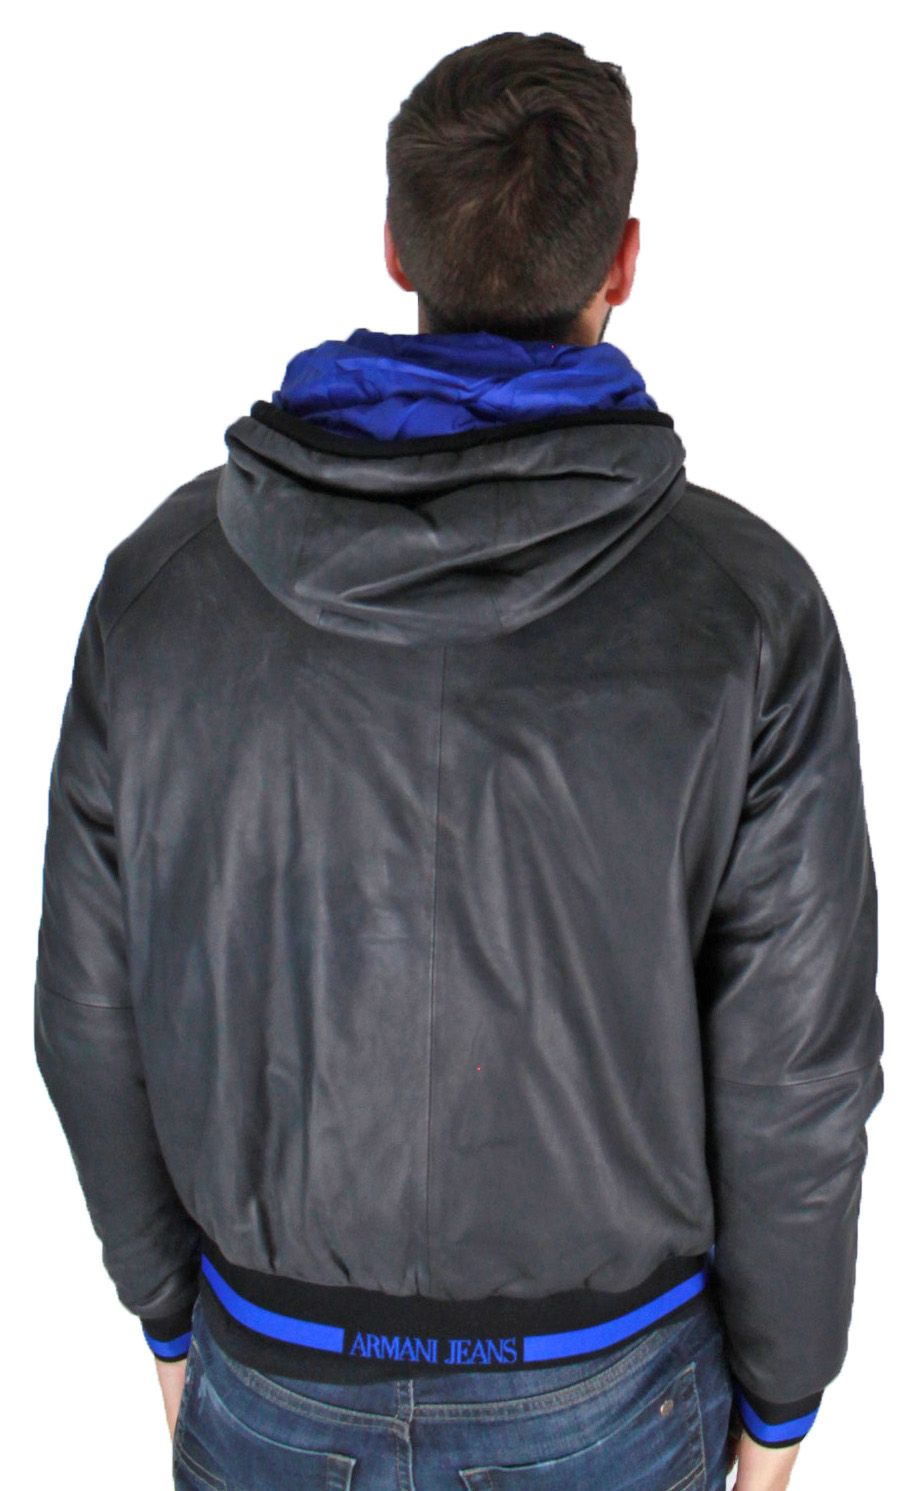 Armani Jeans ZGB04P ZGP03 Jacket